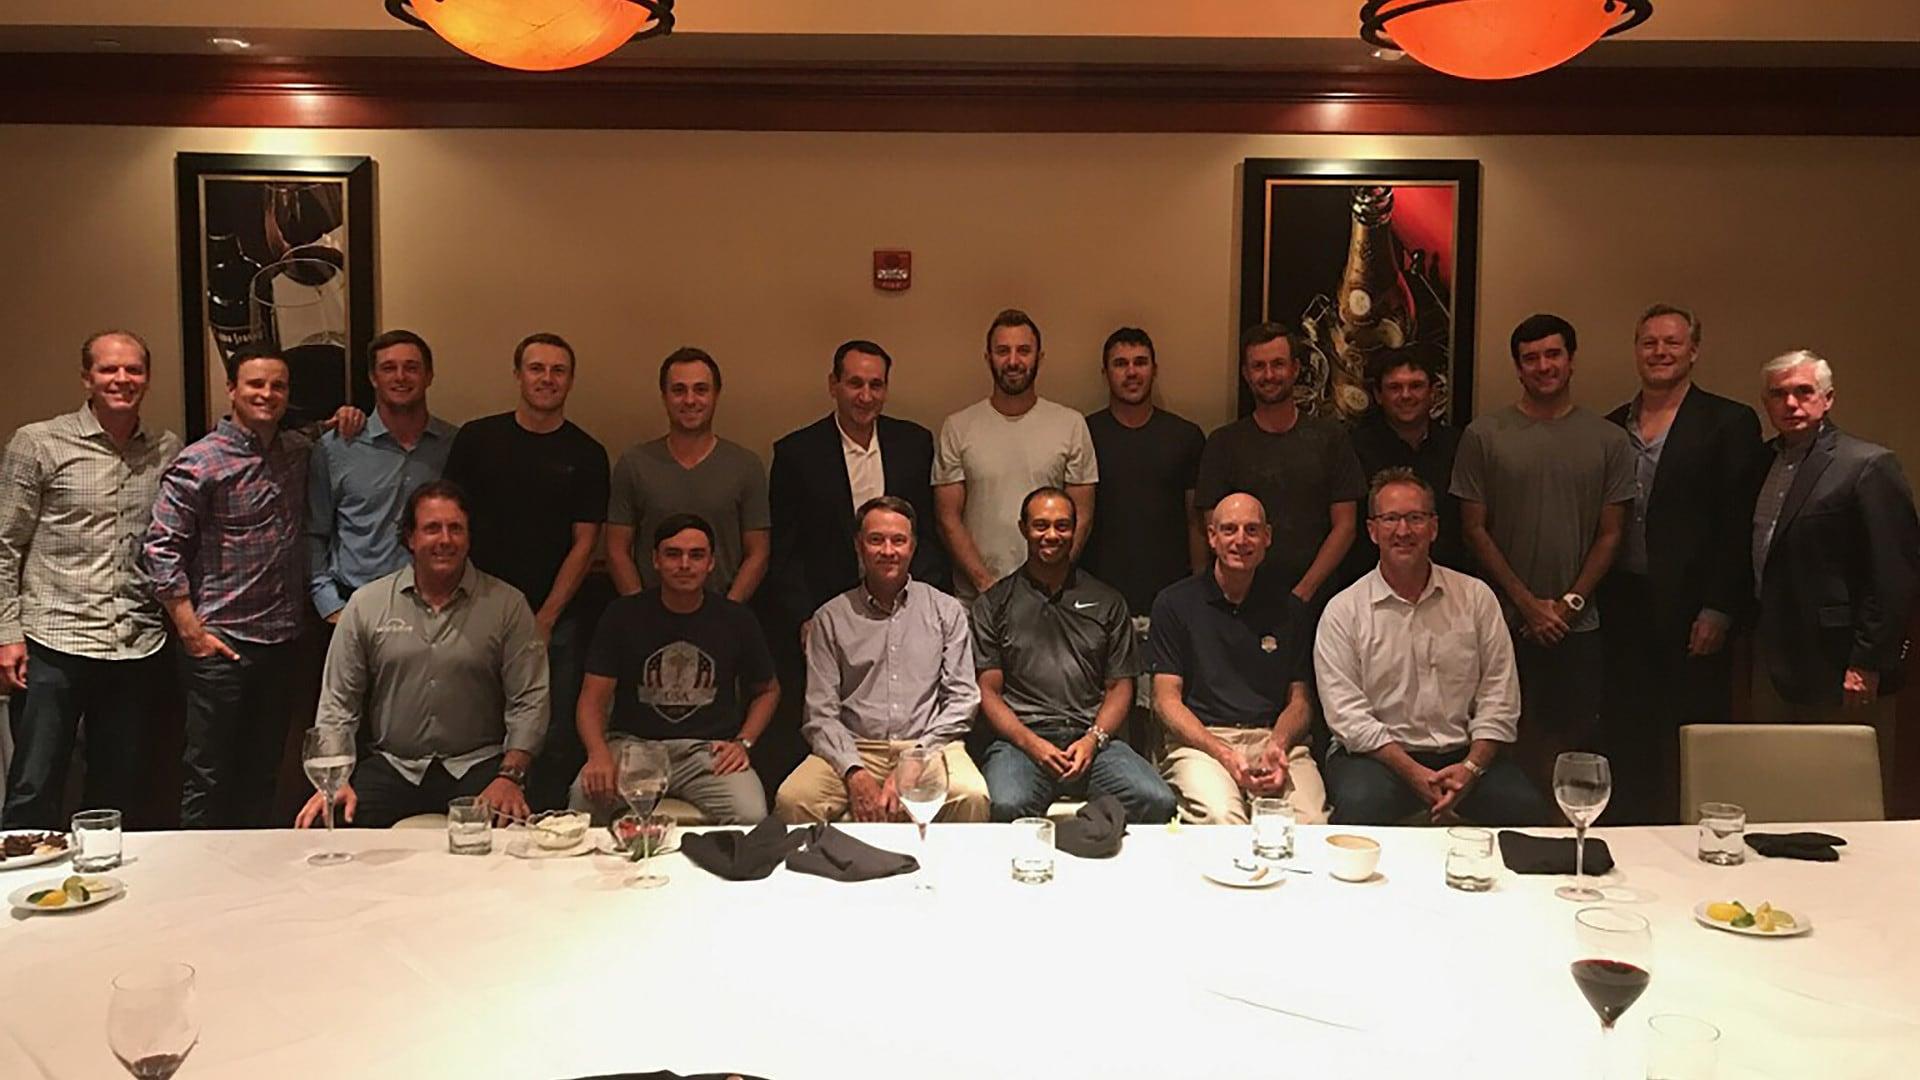 u s  ryder cup team has dinner with duke basketball coach